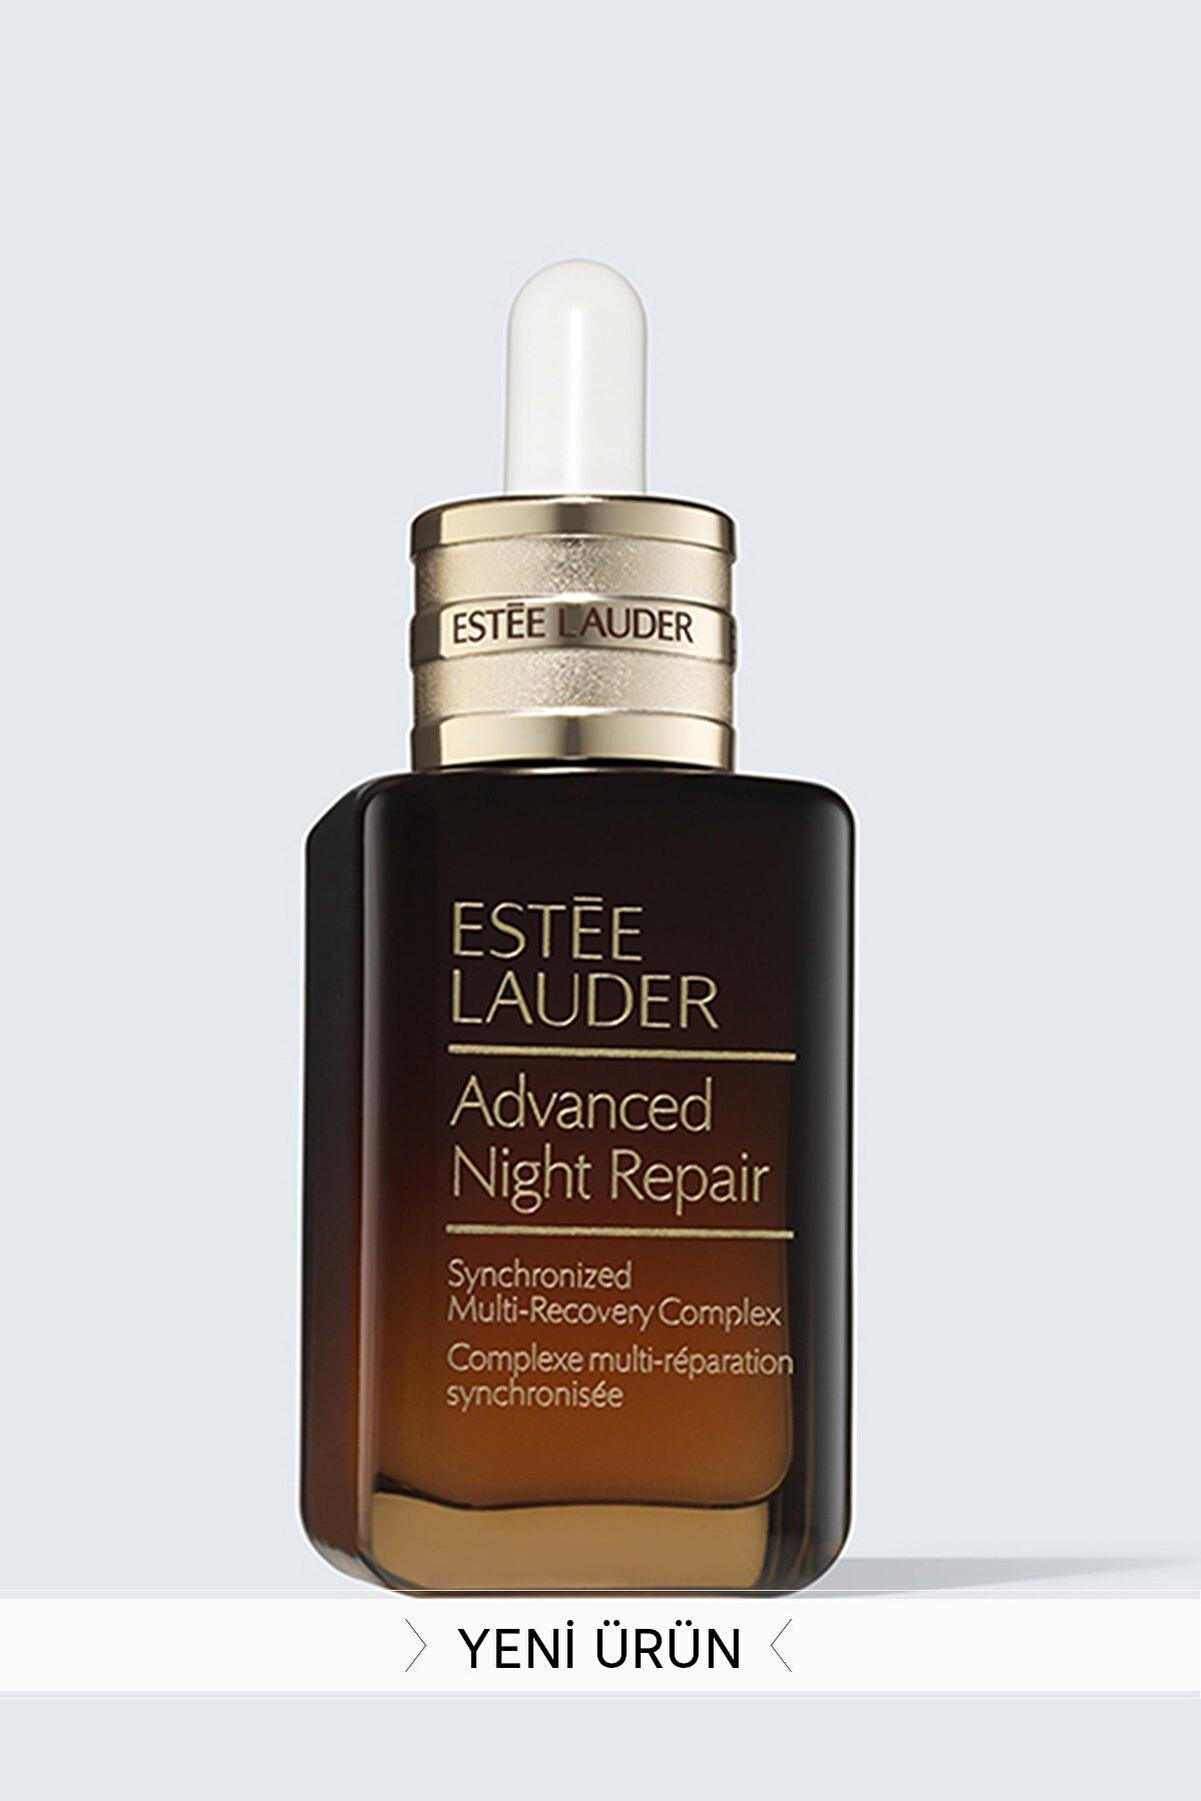 Estee Lauder Yaşlanma Karşıtı Serum - Advanced Night Repair Onarıcı Gece Serumu 30 ml 887167485471